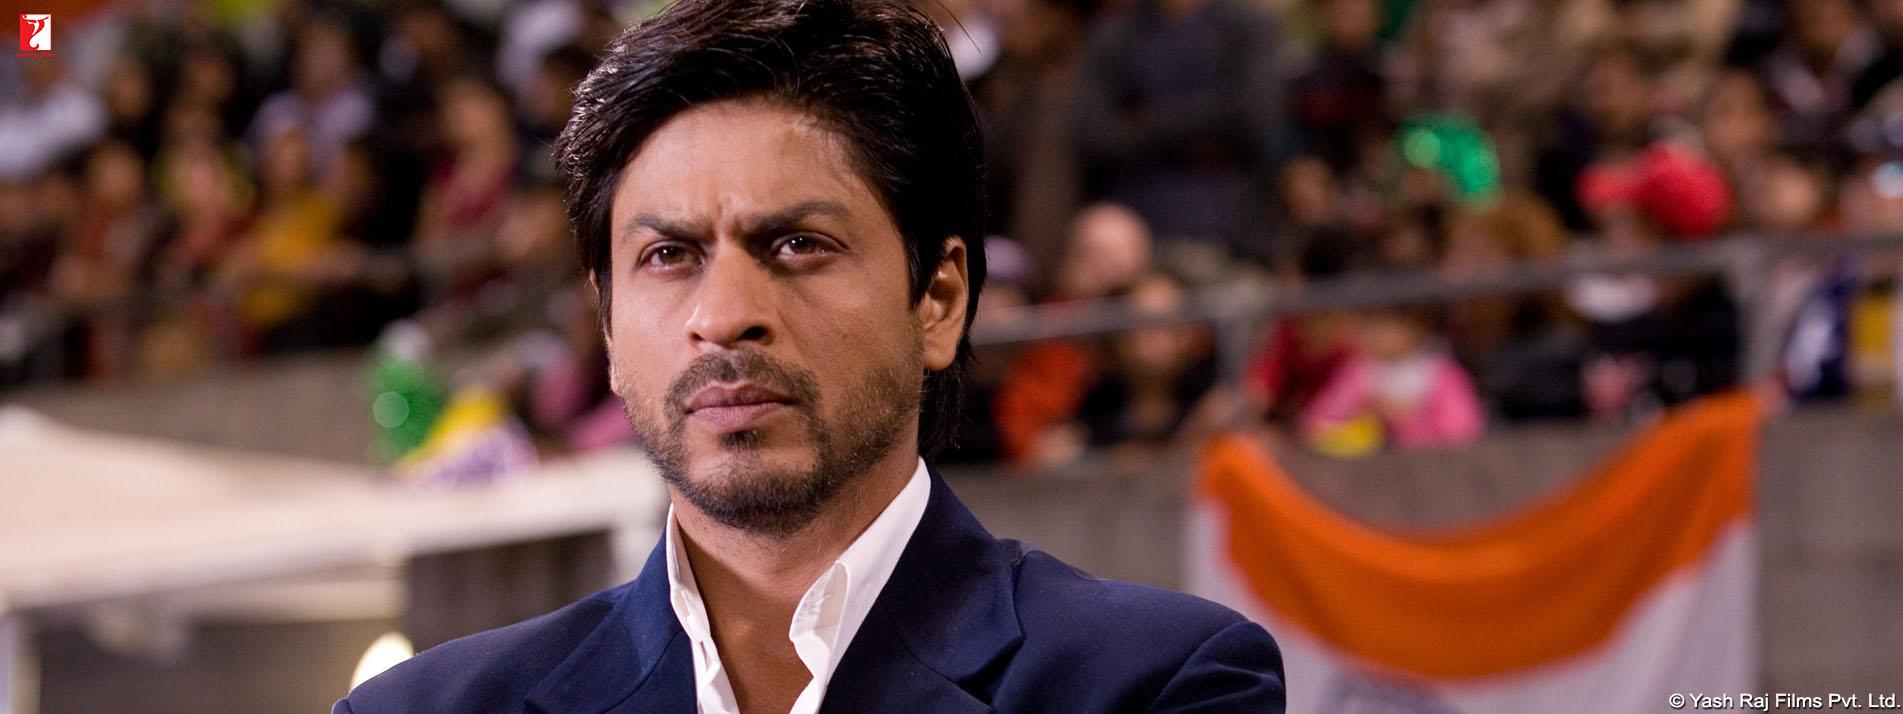 Chak De India Movie Video Songs Movie Trailer Cast Amp Crew Details Yrf